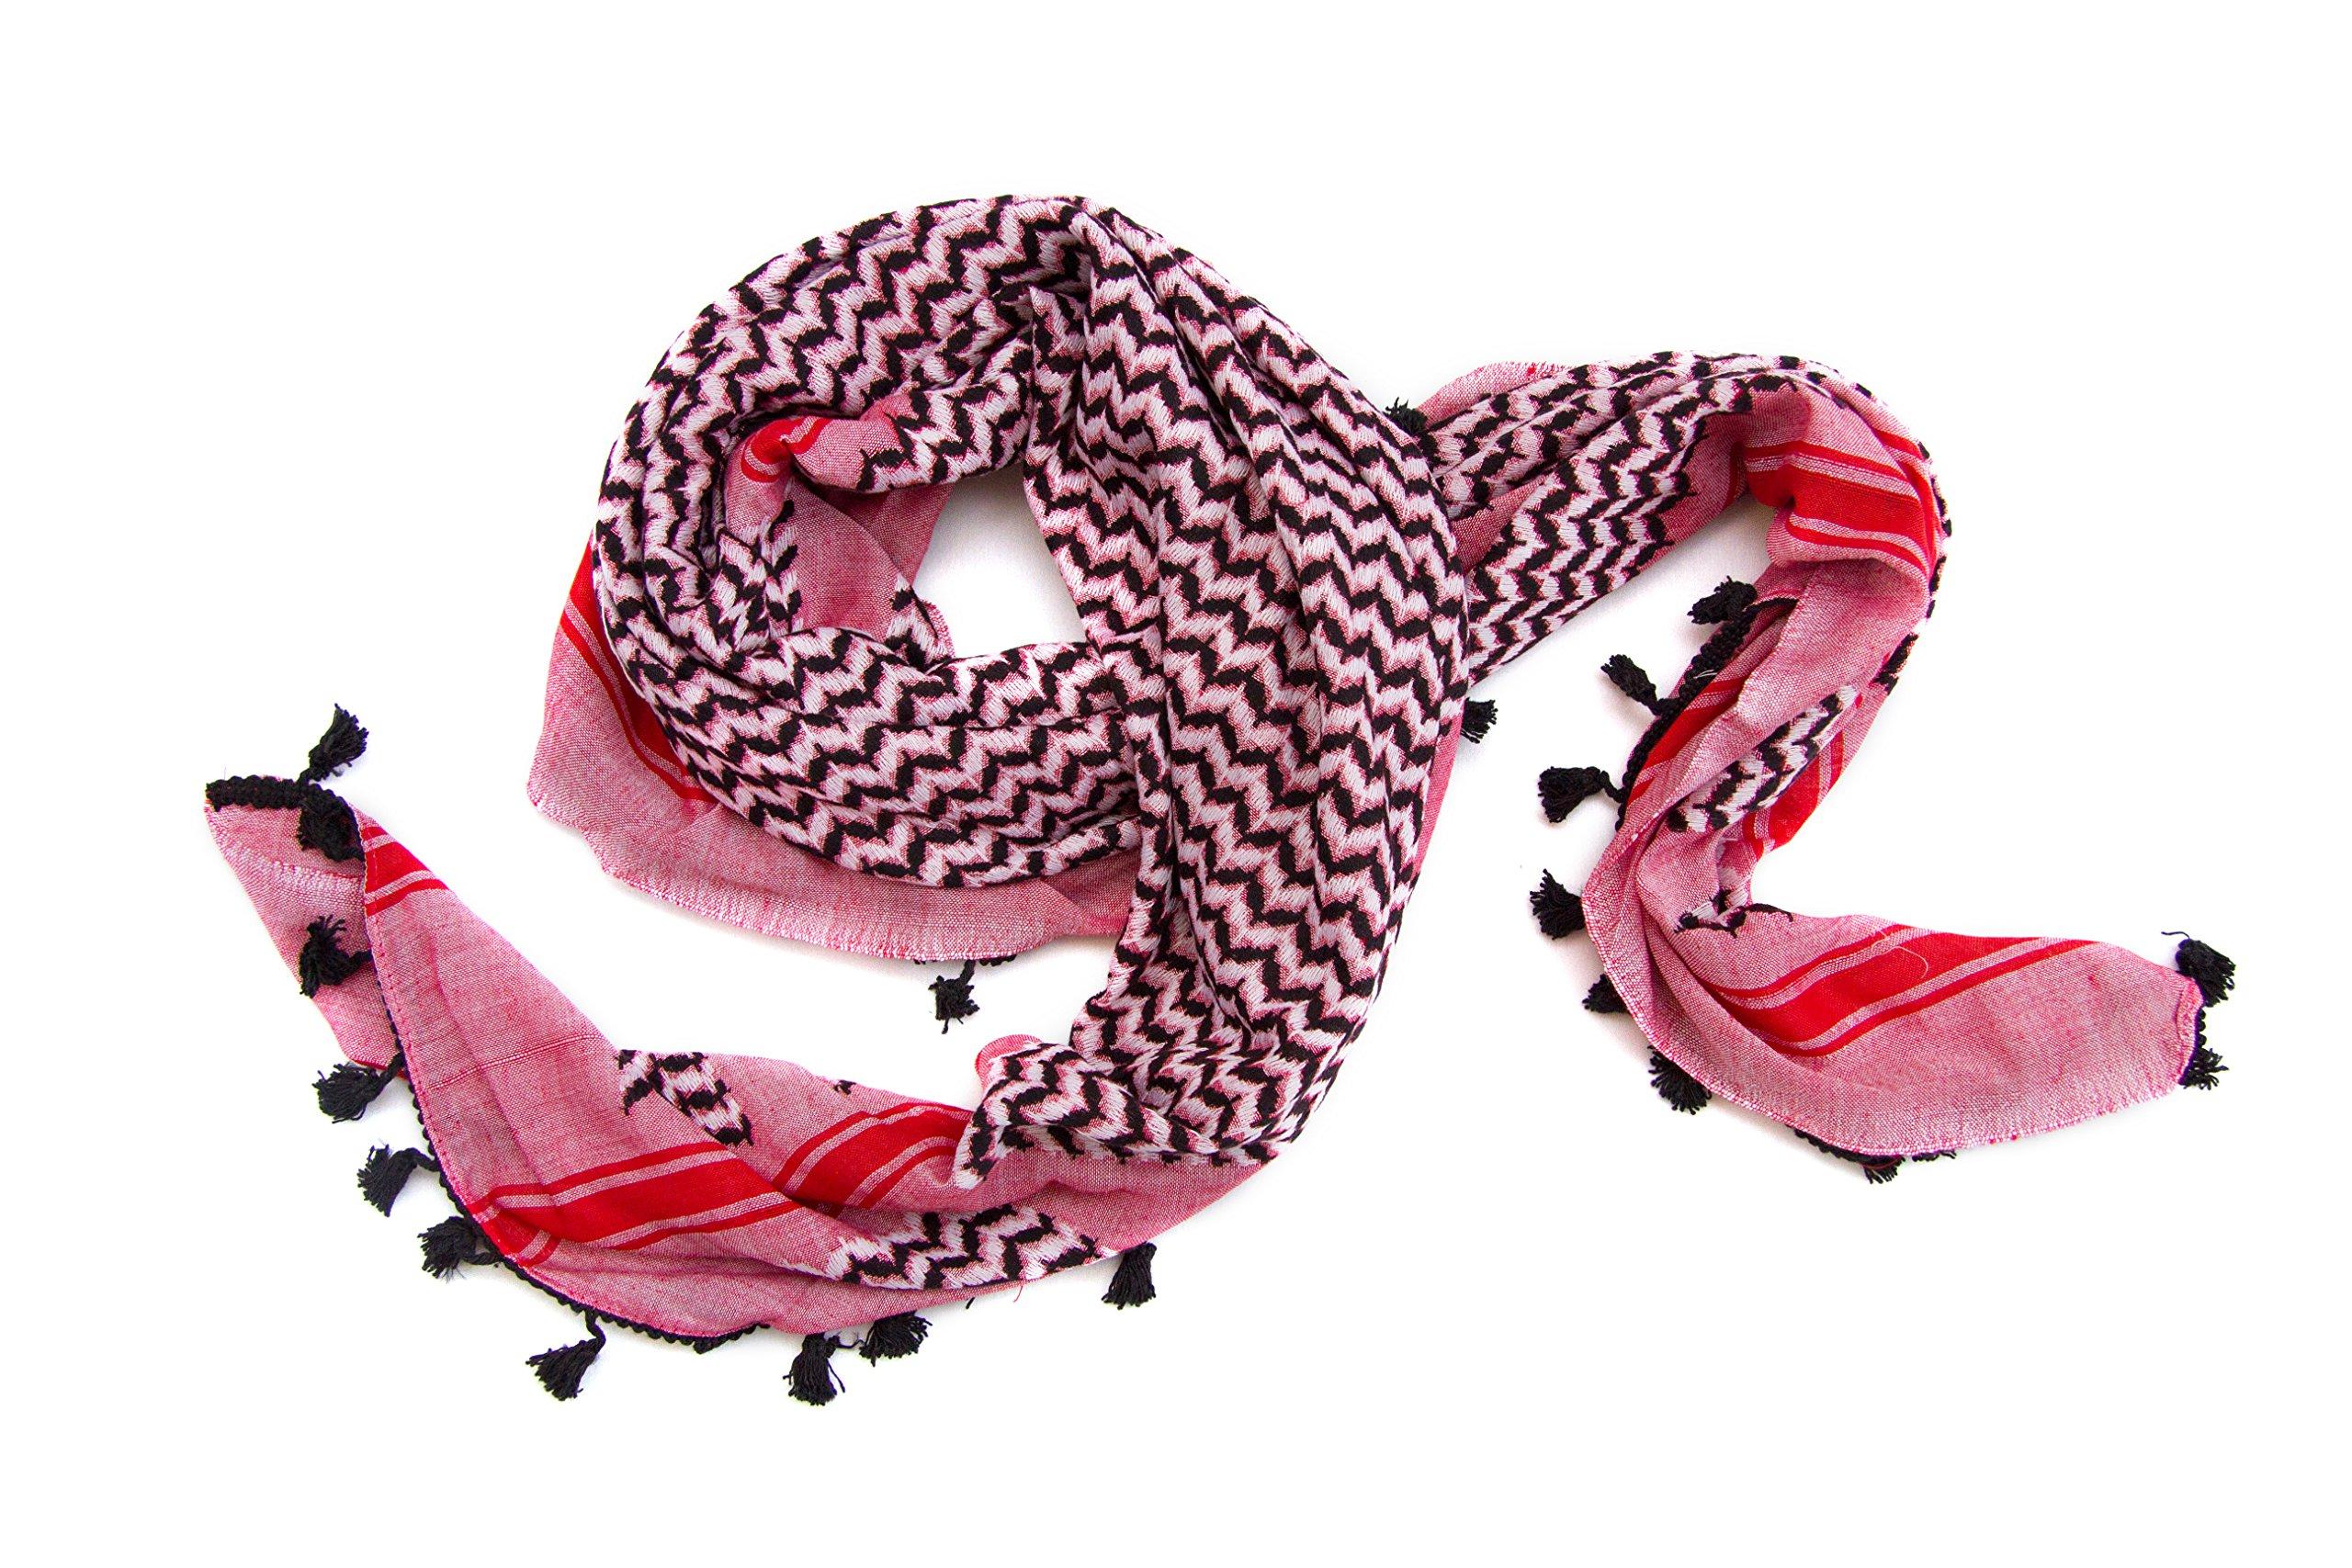 Hirbawi Premium Arabic Scarf 100% Cotton Shemagh Keffiyeh 47''x47'' Arab Scarf (Pink Zahra) Made in Palestine by Hirbawi (Image #3)